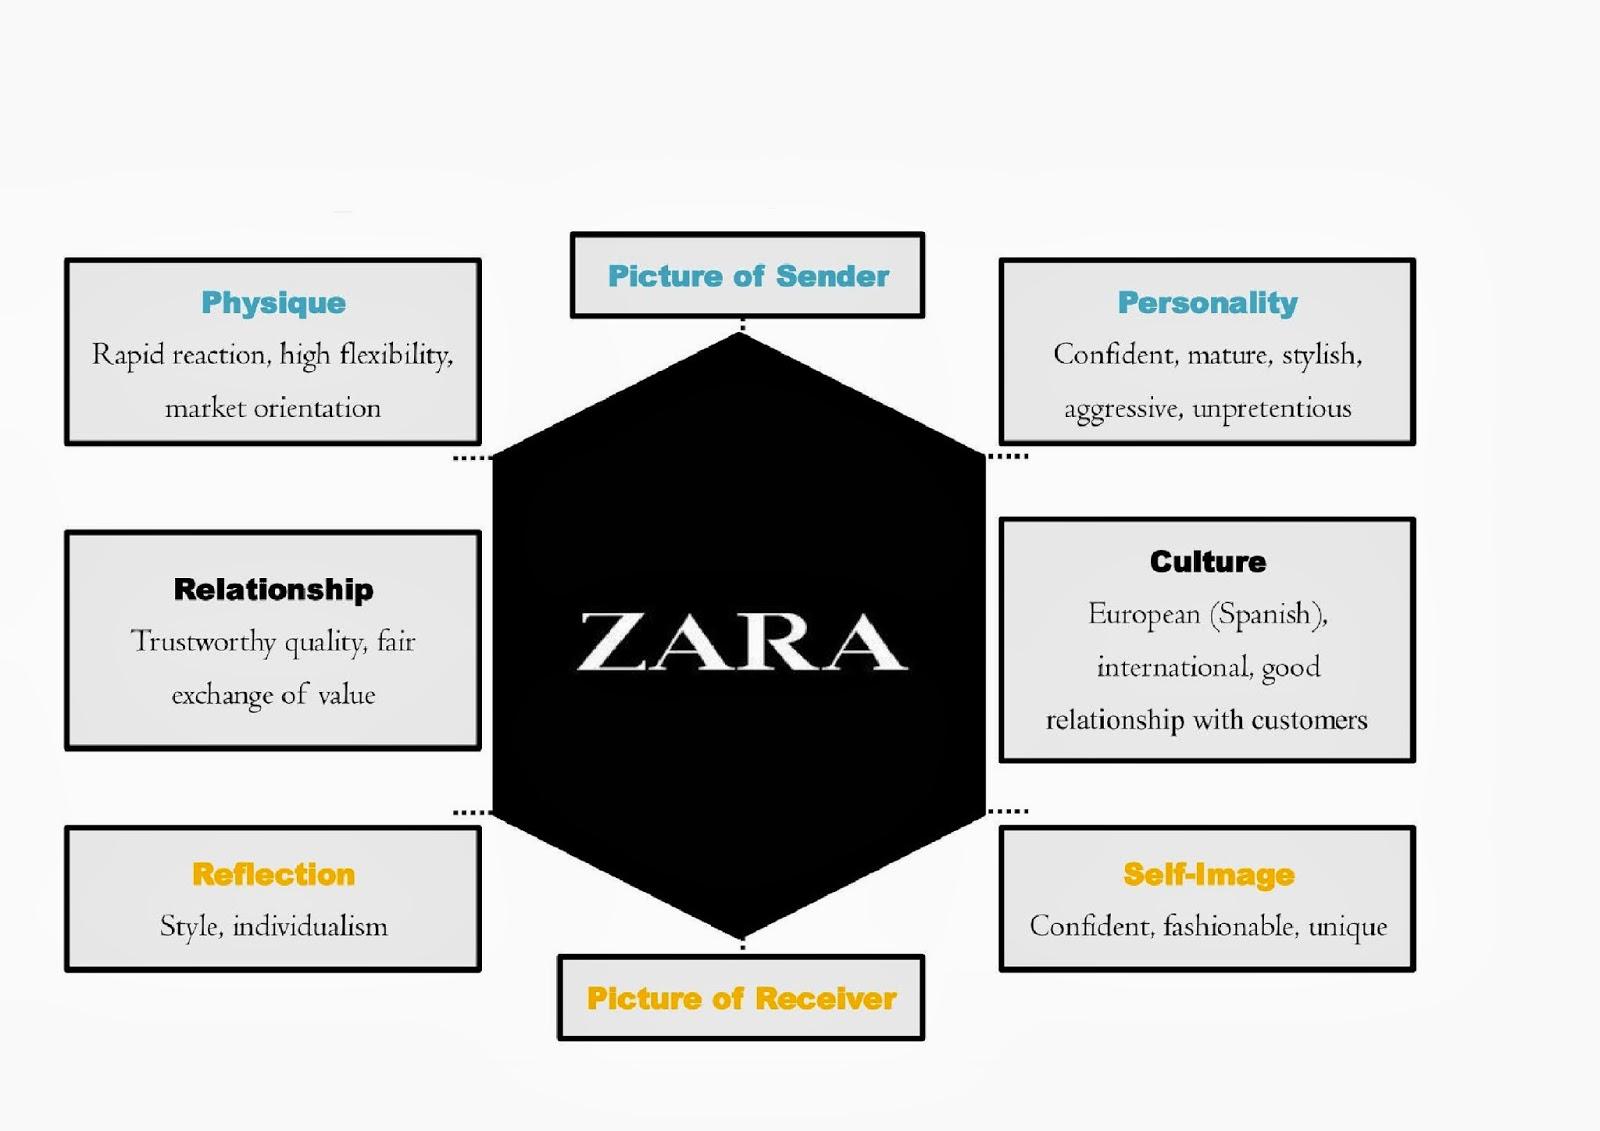 zara case study analysis zara segmentation by best custom paper  brand identity prism for zara marketing assignment brand identity prism for zara marketing assignment models zara